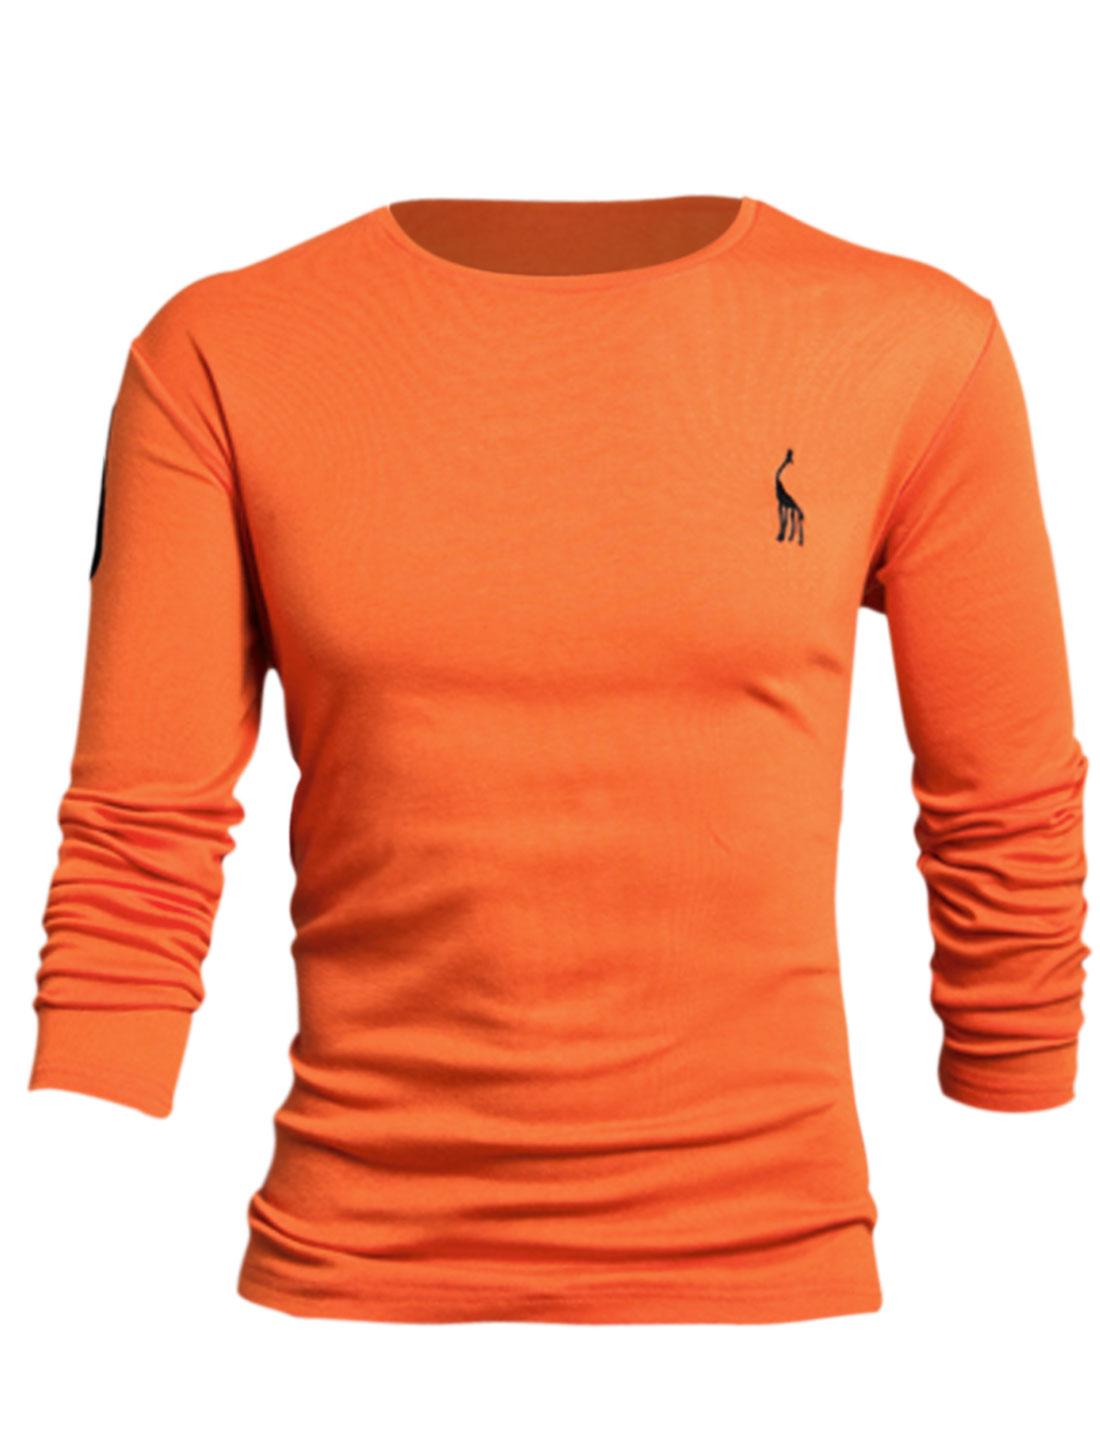 Men Deer Embroidery Number Applique Casual Soft Tee Shirt Orange L